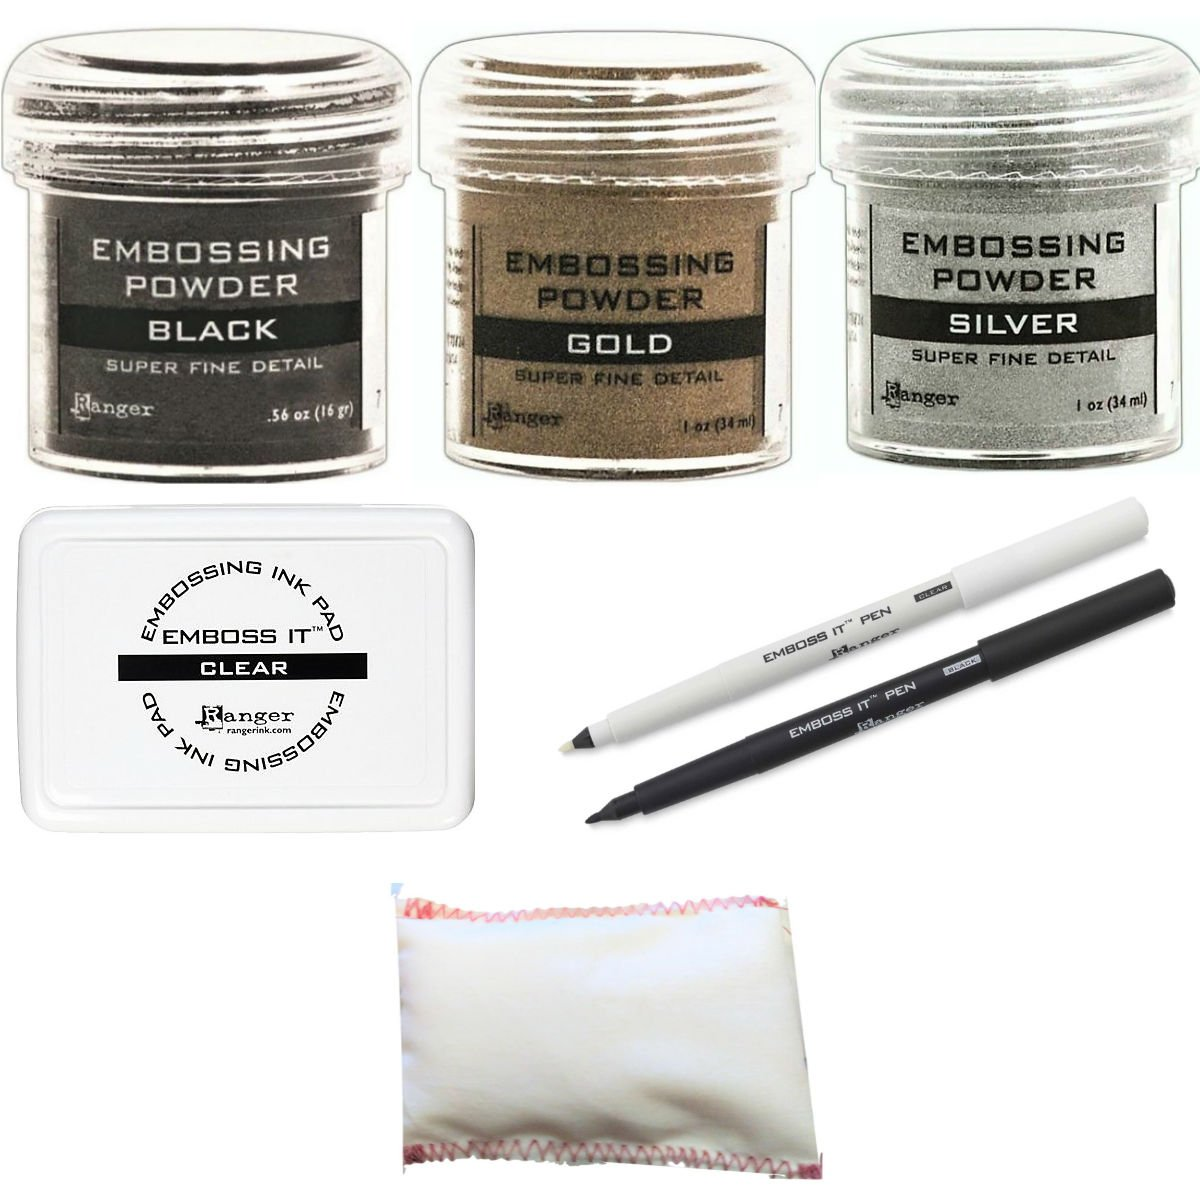 Embossing Kit Bundle - 3 Ranger Super Fine Embossing Powder, 1 Bye Bye Static Pad, 1 Ranger Emboss It Foam Pad and Two Emboss It Pens Black and Clear